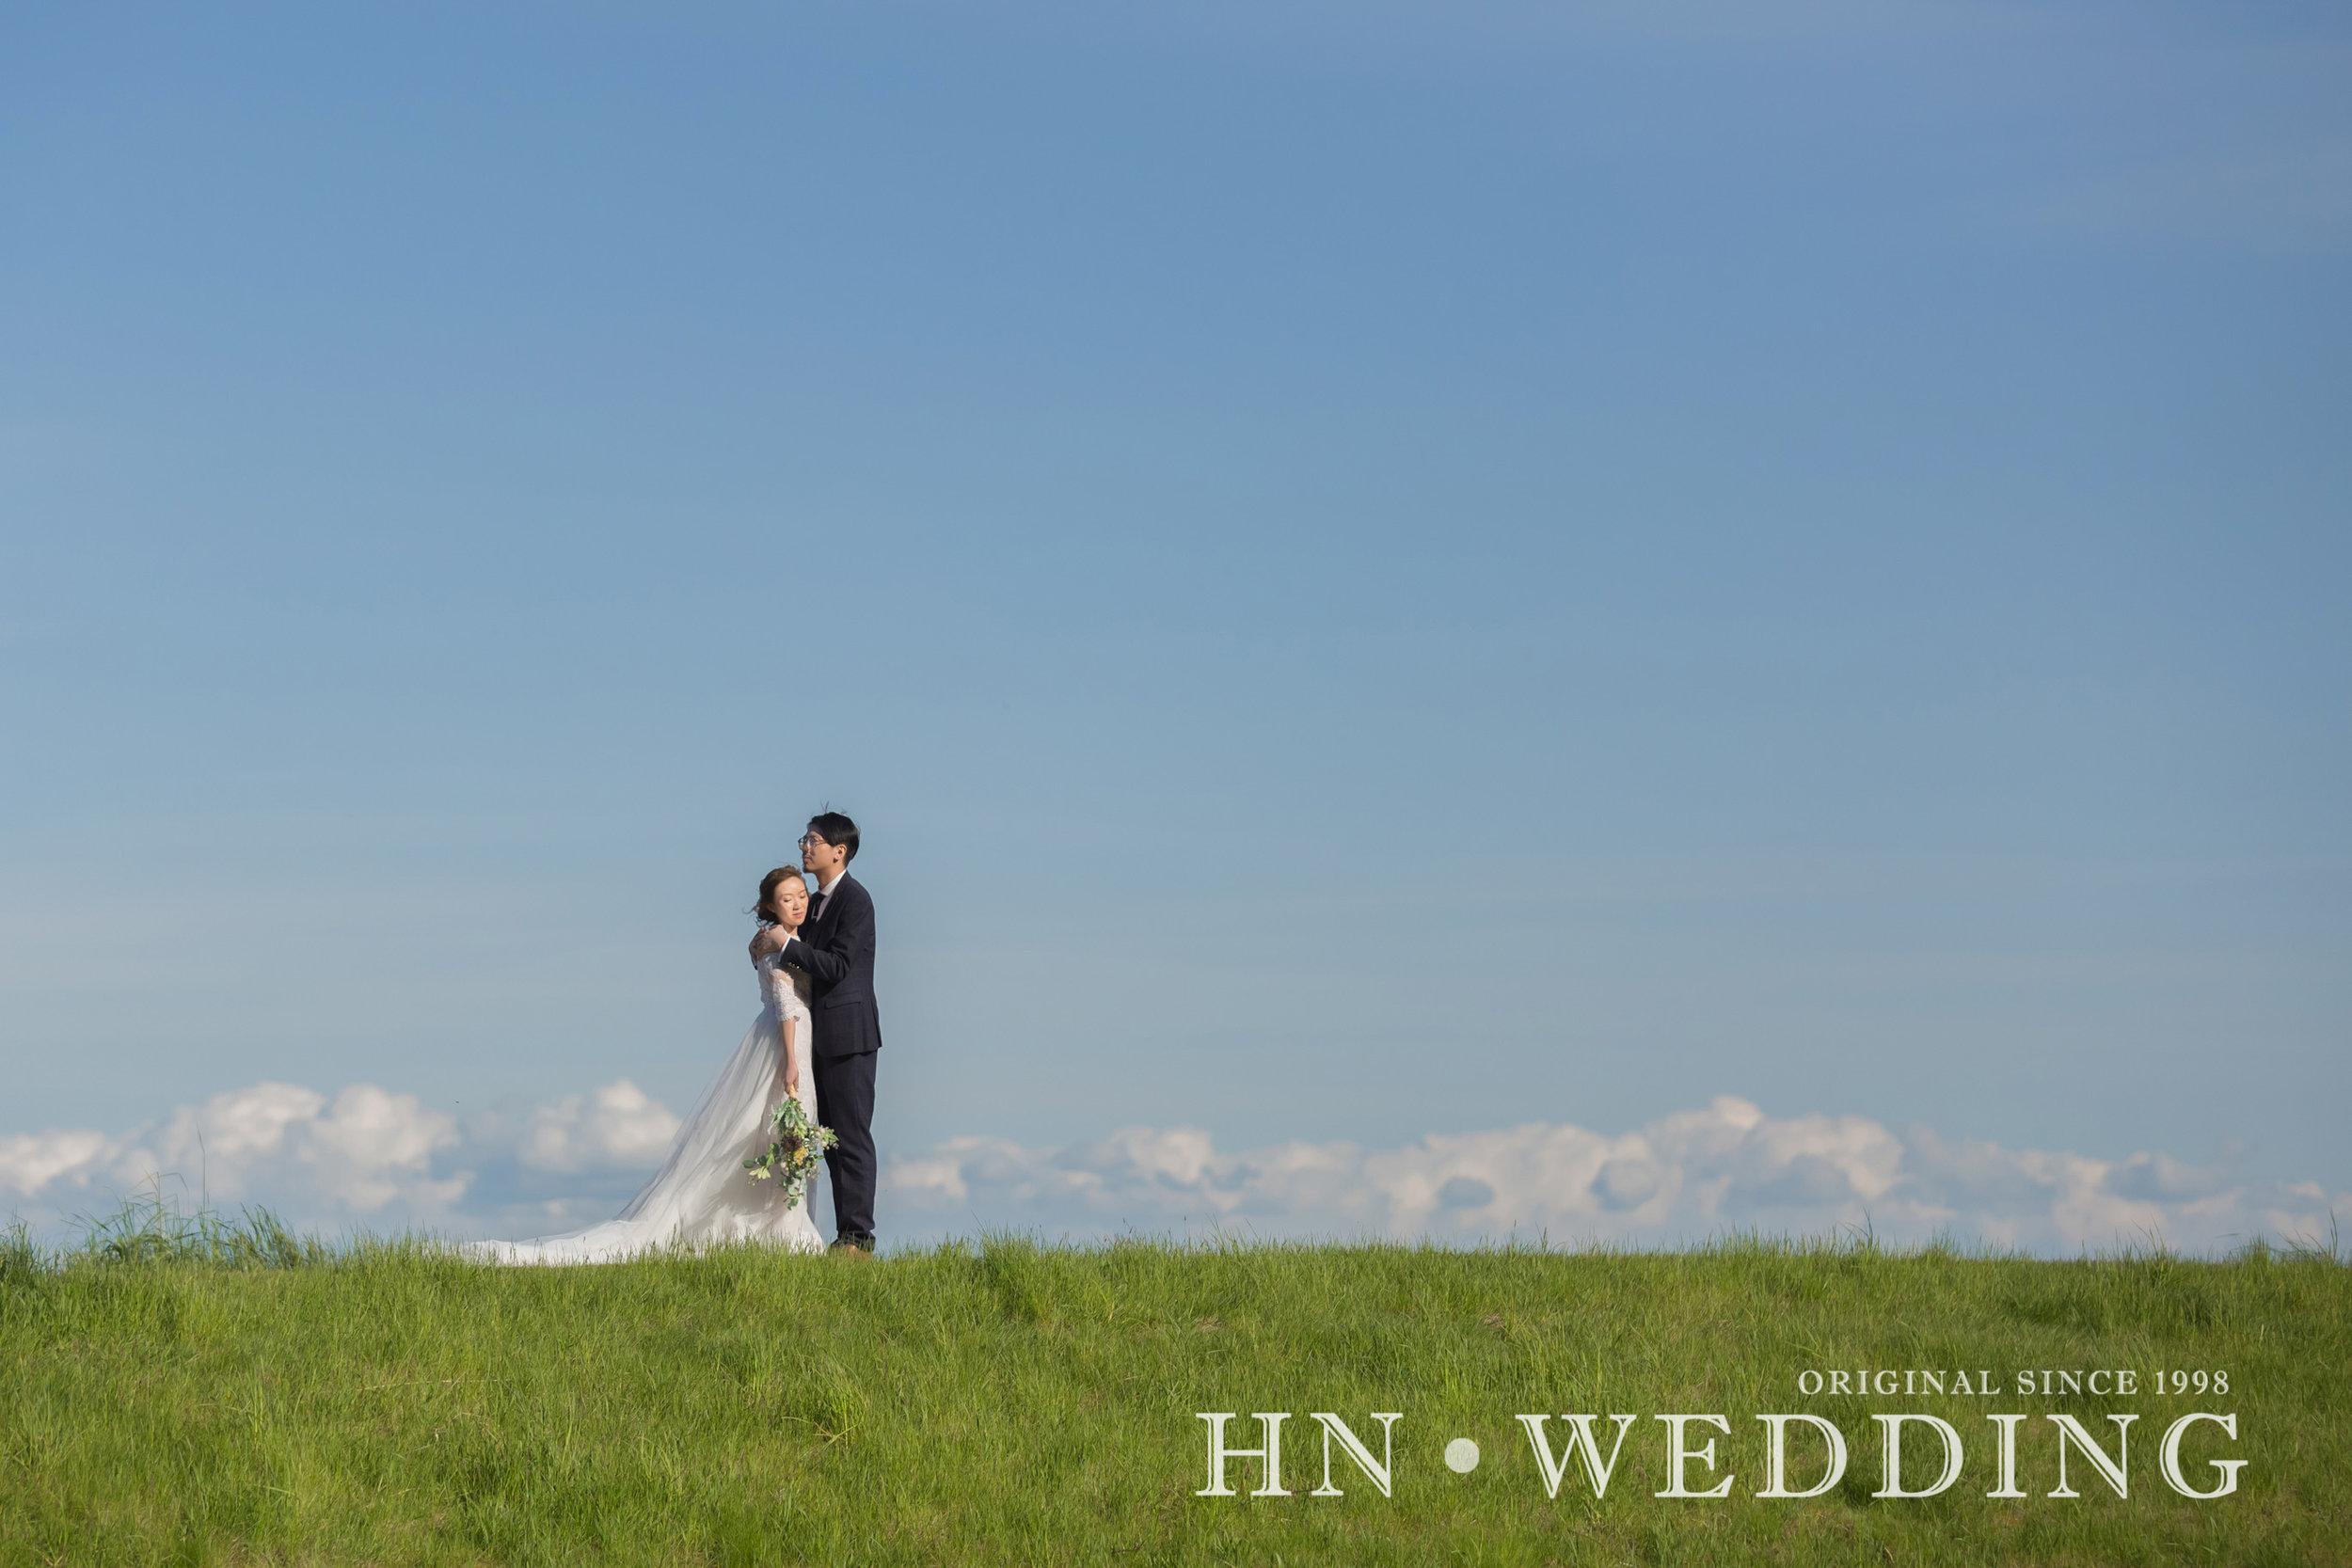 hnweddingweddingdayA&R-30.jpg